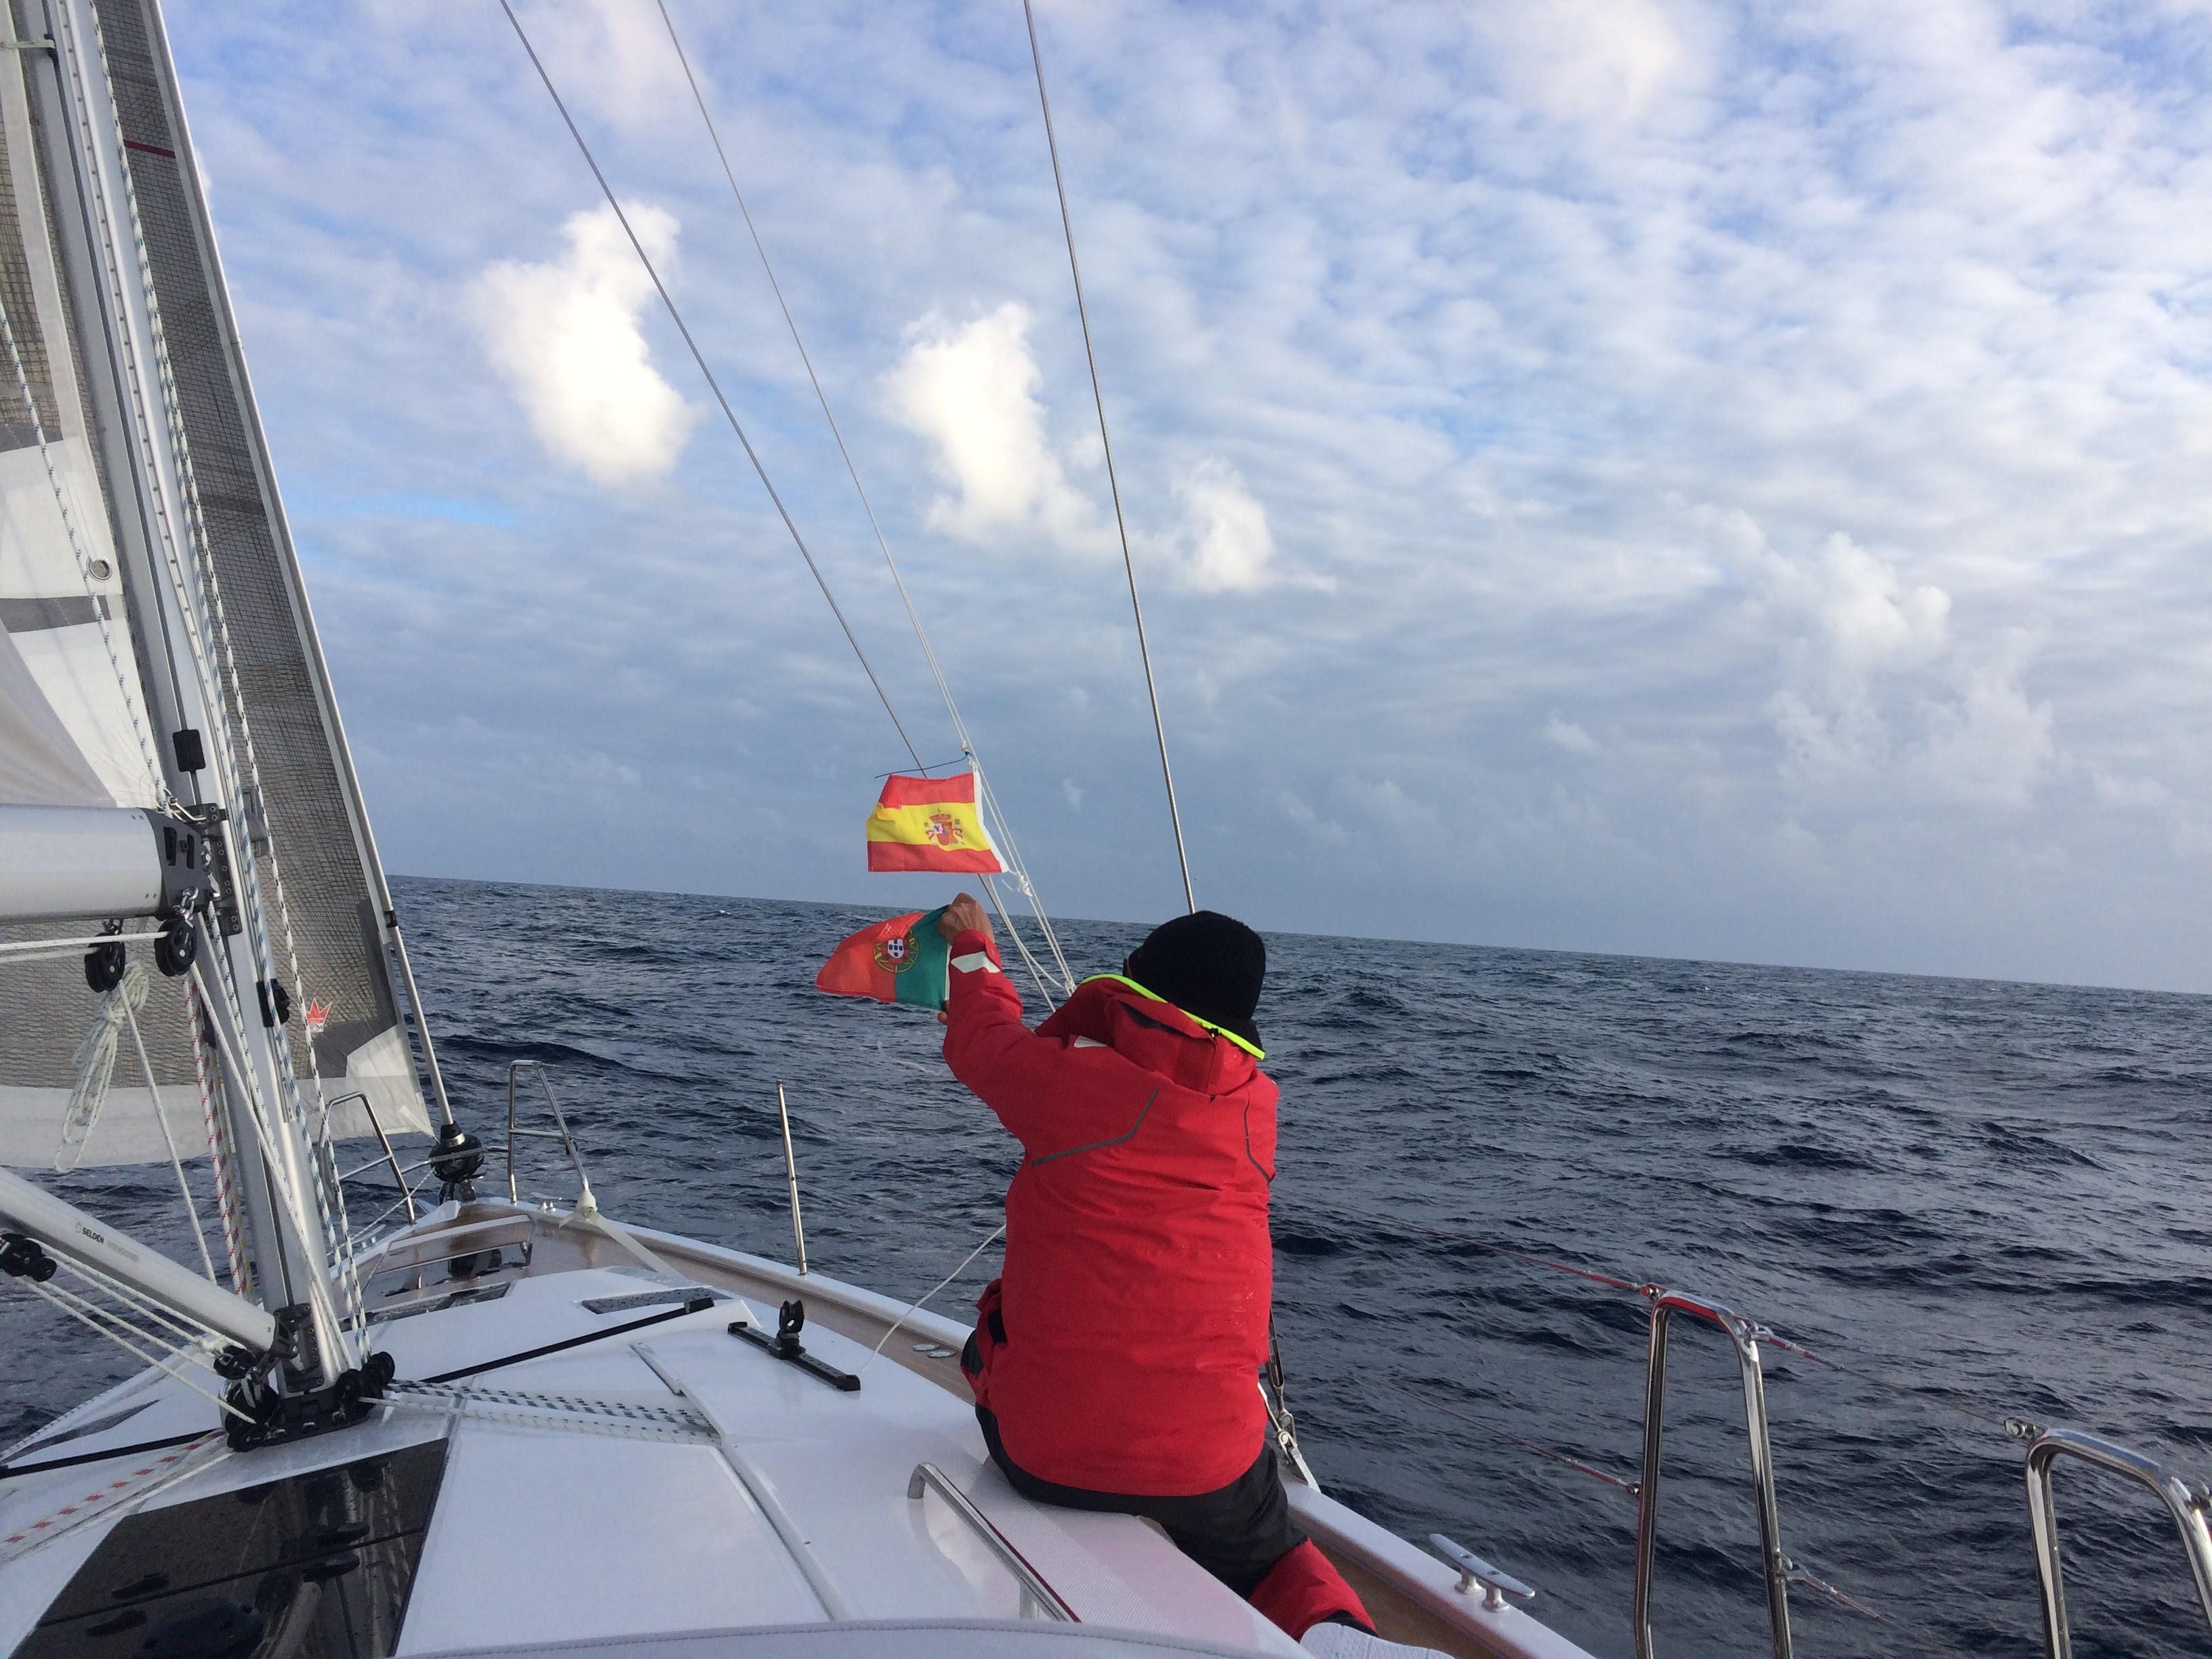 Solo traveller setting a courtesy flag